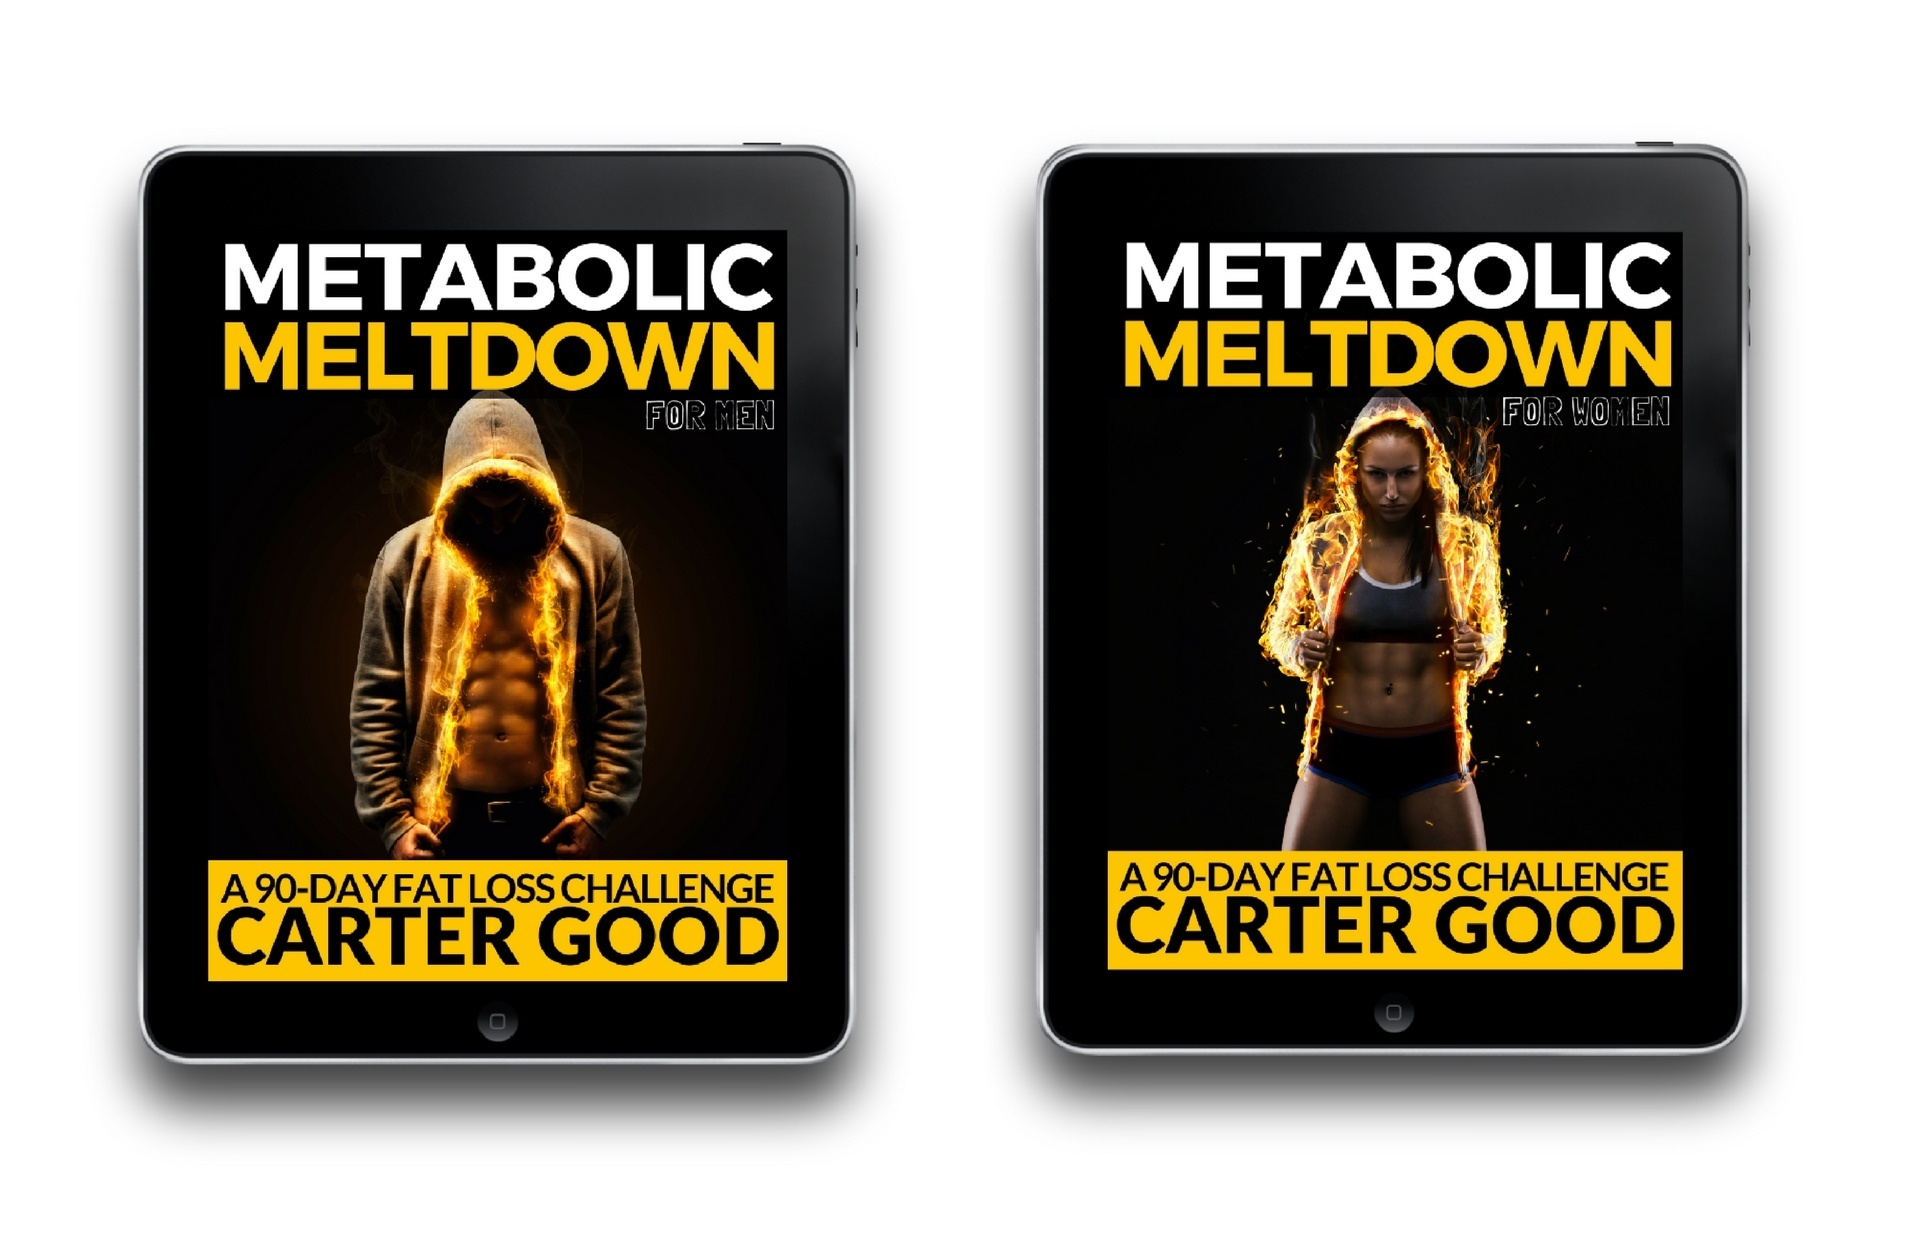 [men & women] Metabolic Meltdown iPad 16:9